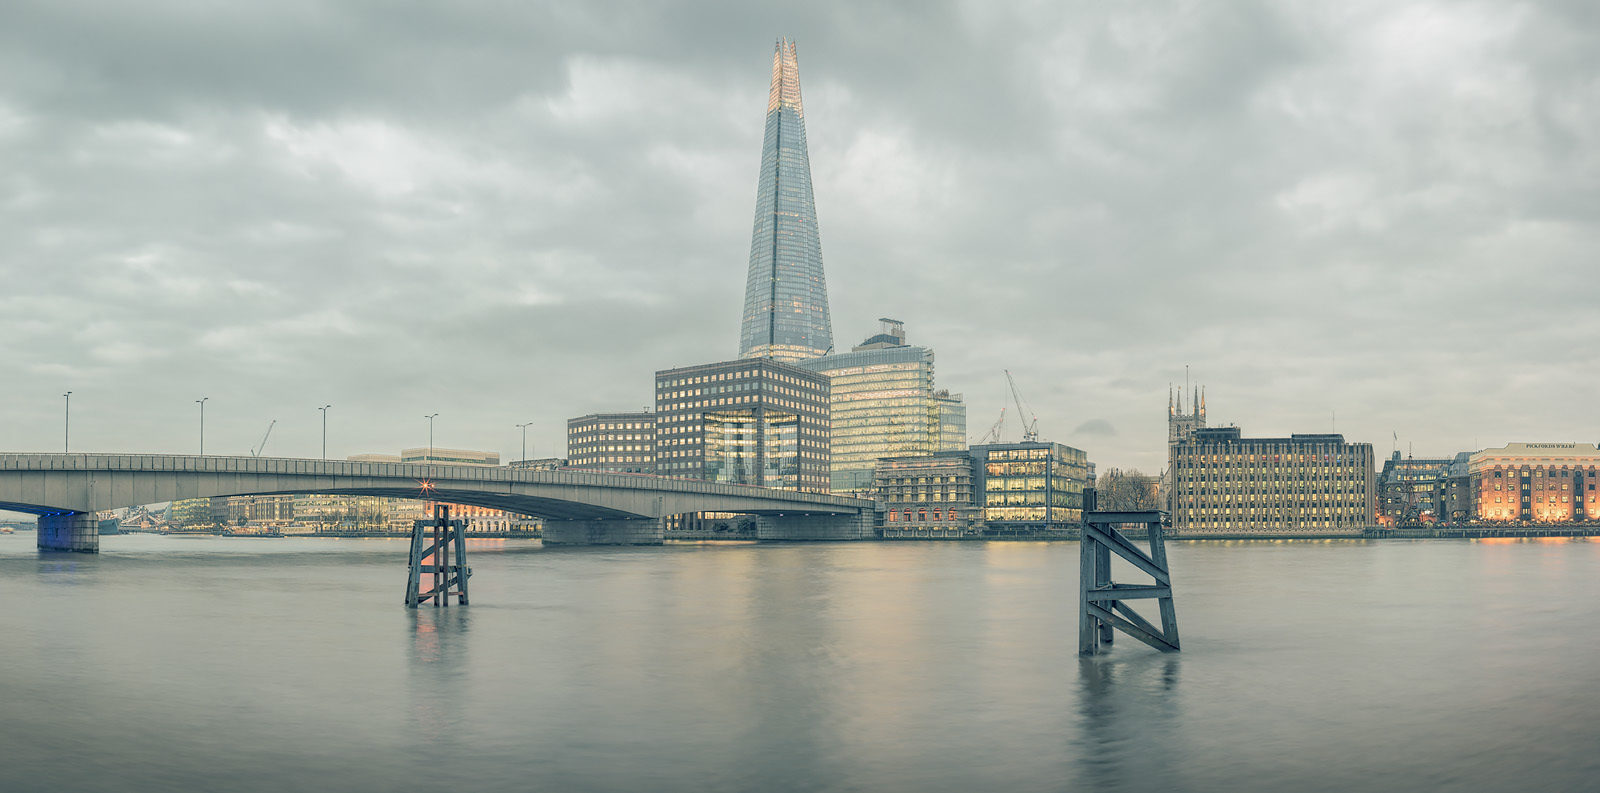 Planate London Acrylic - High-Res London Cityscape